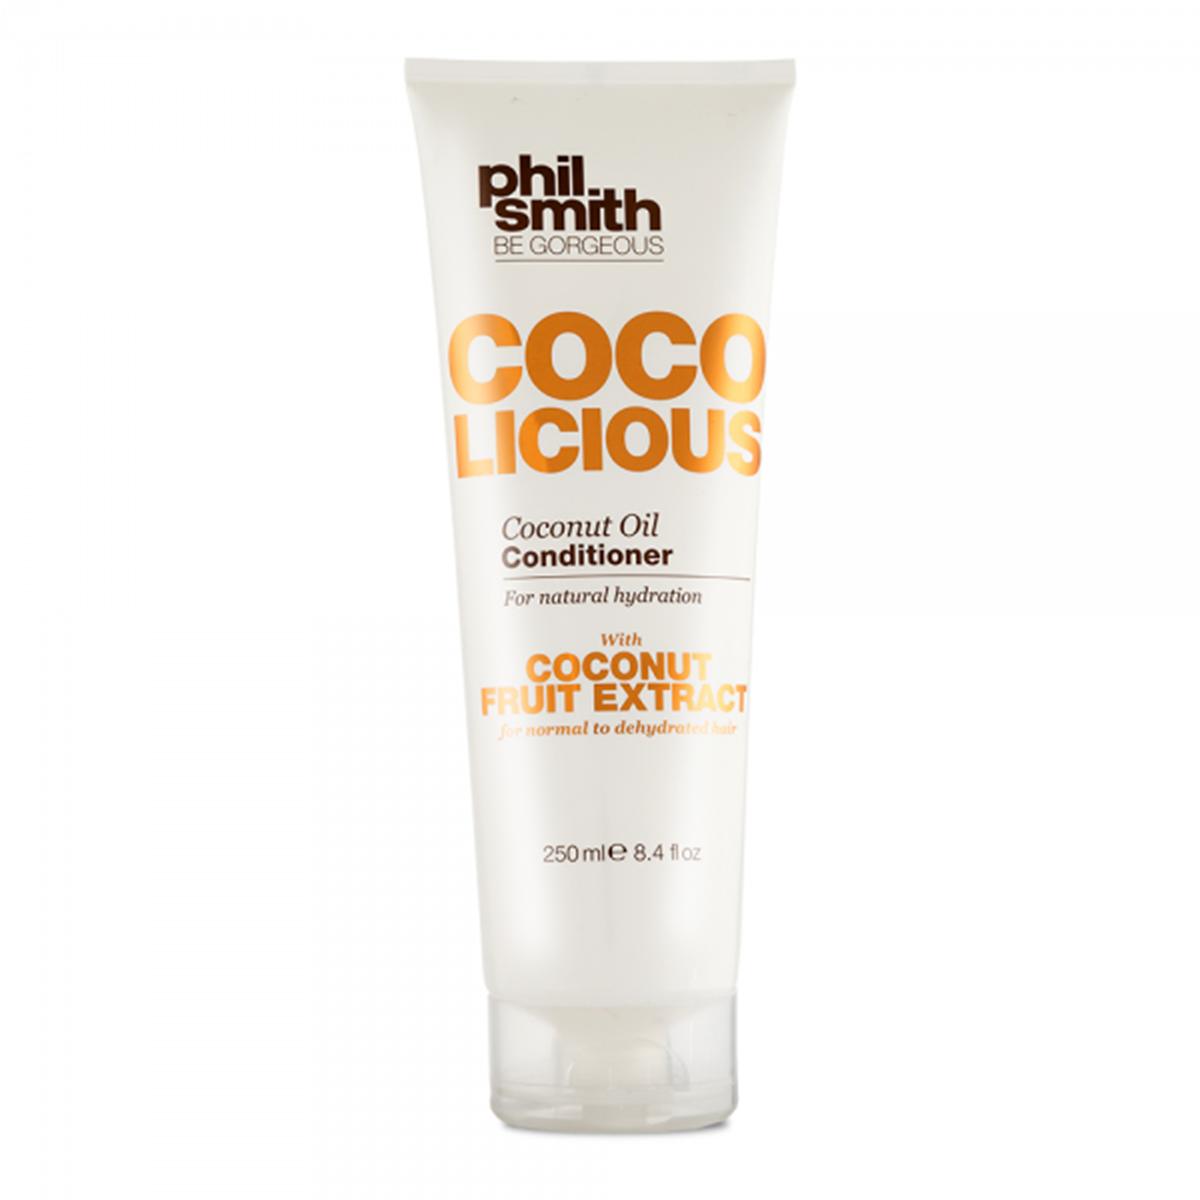 Phil Smith Coco Licious Coconut Oil Saç Kremi 250 Ml